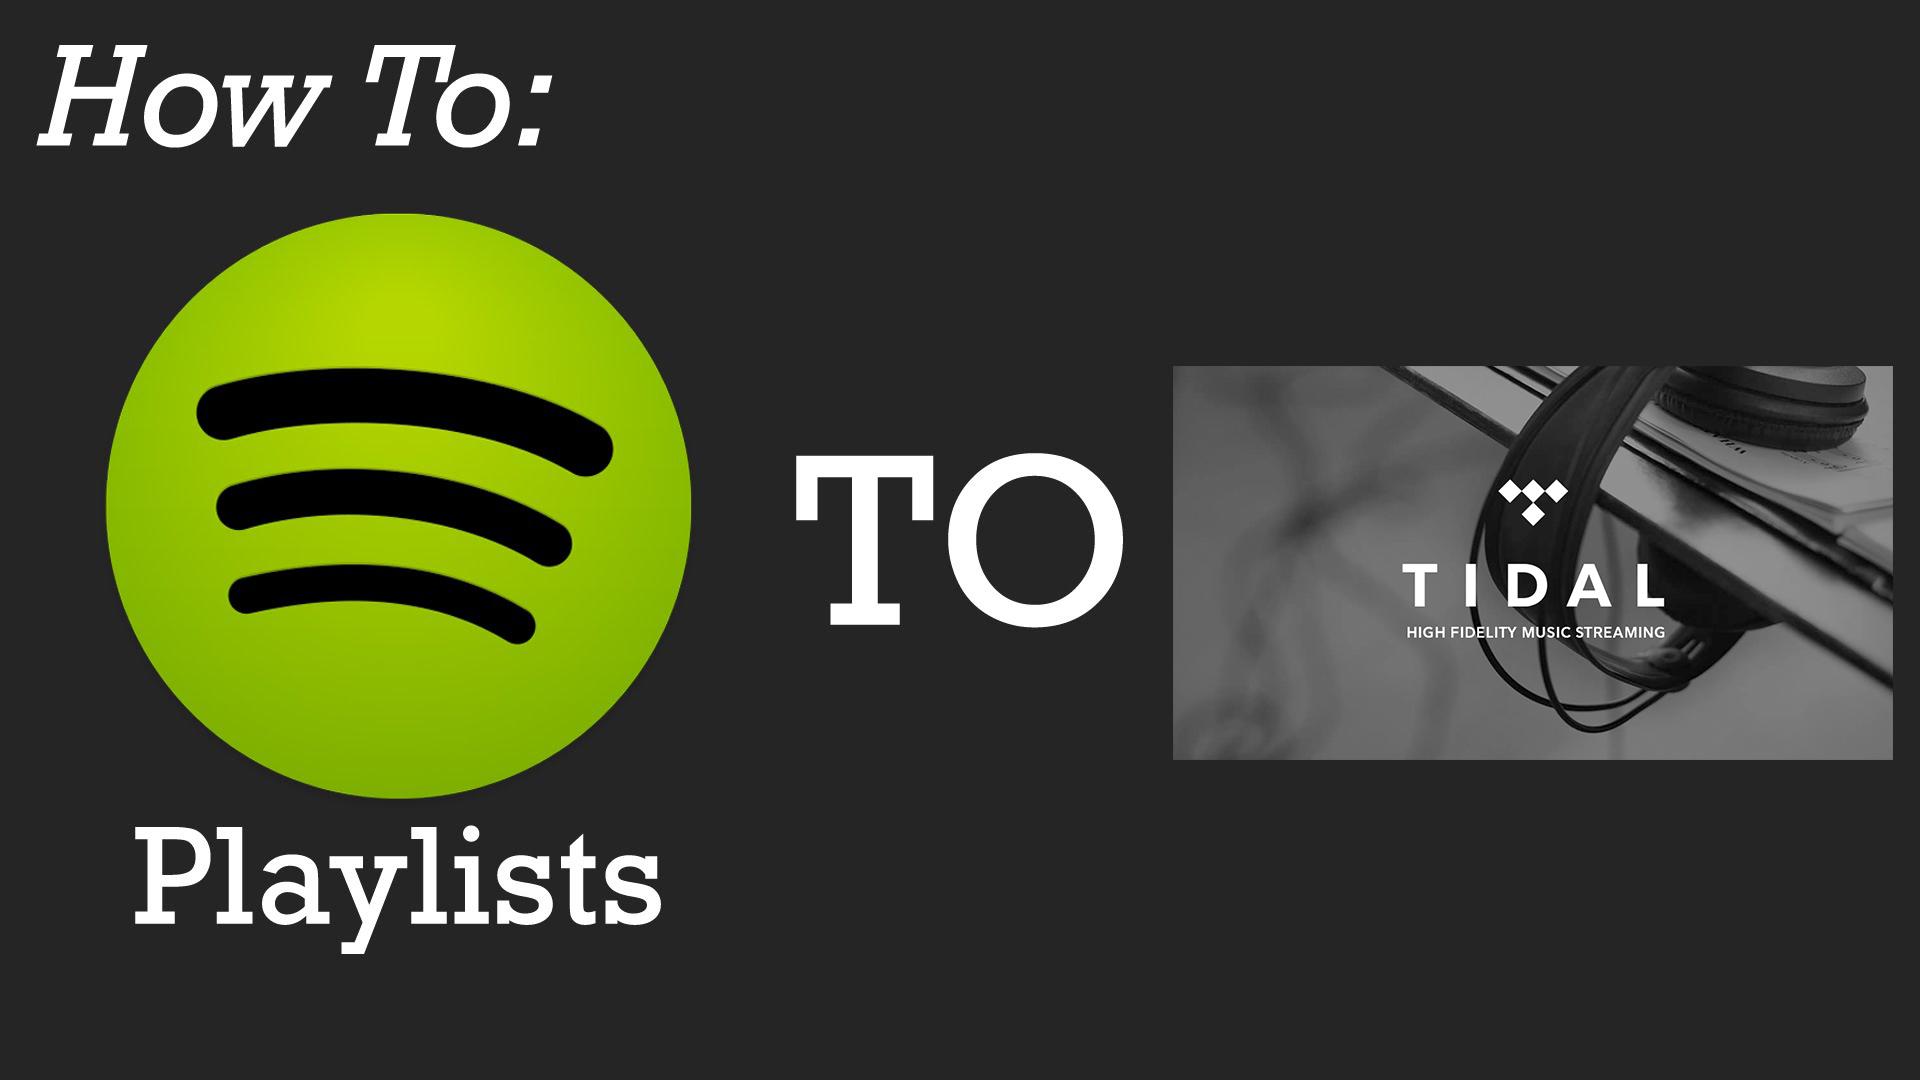 How to transfer spotify playlist to tidal?